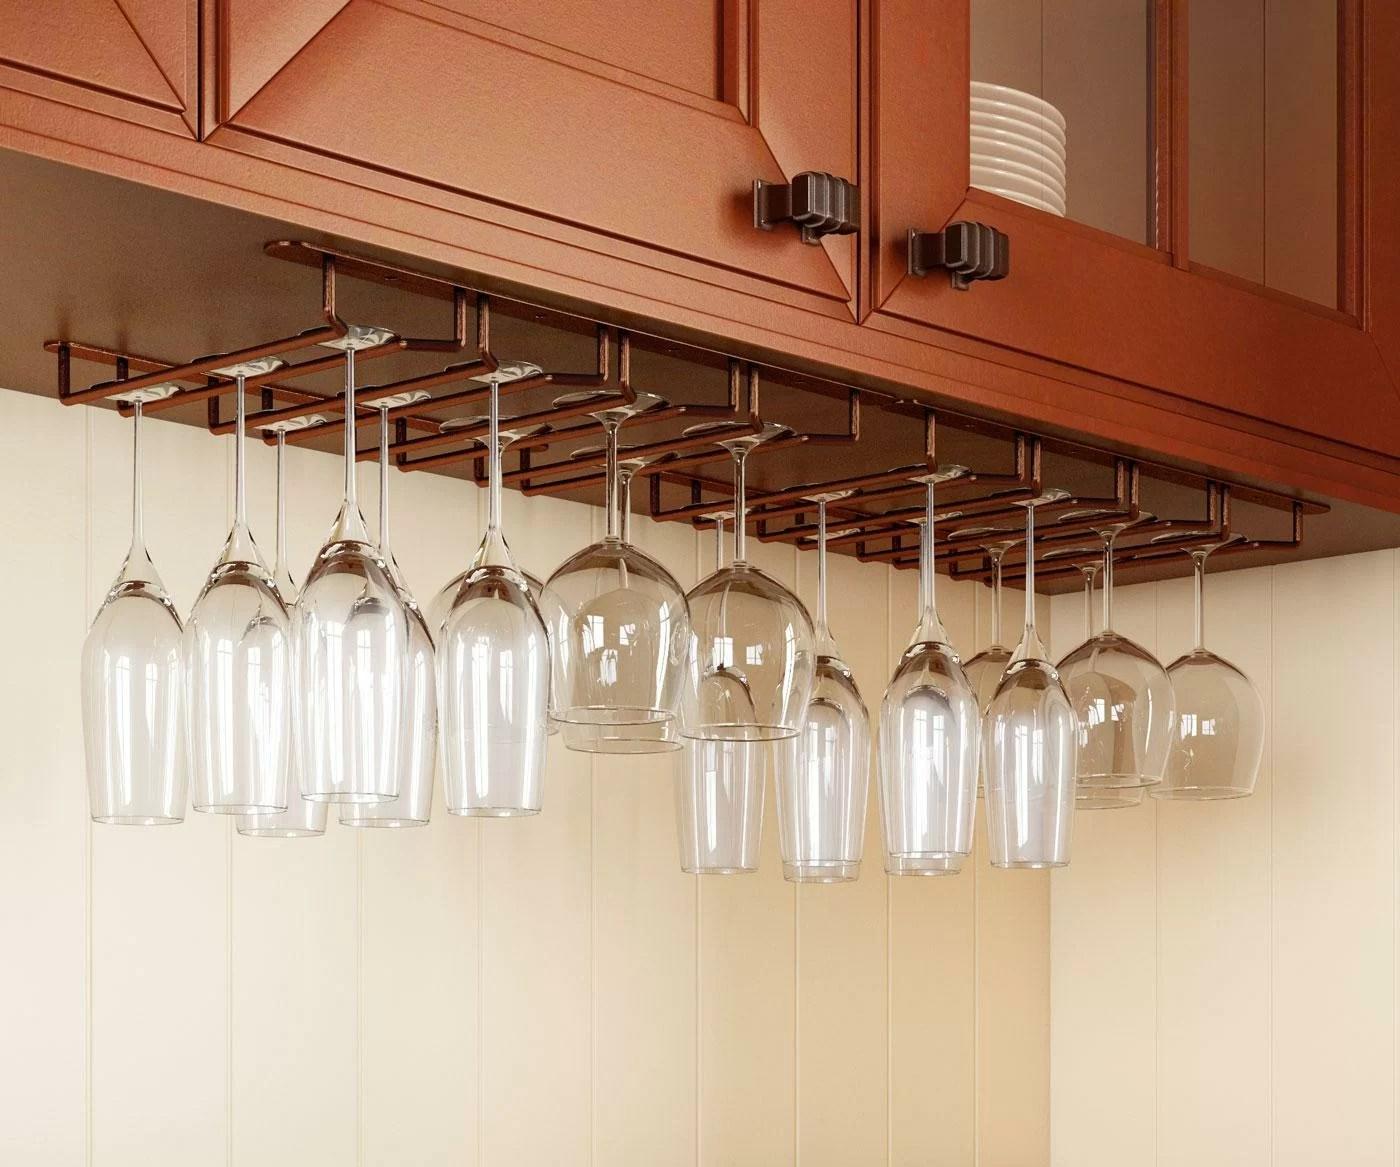 winn hanging wine glass rack